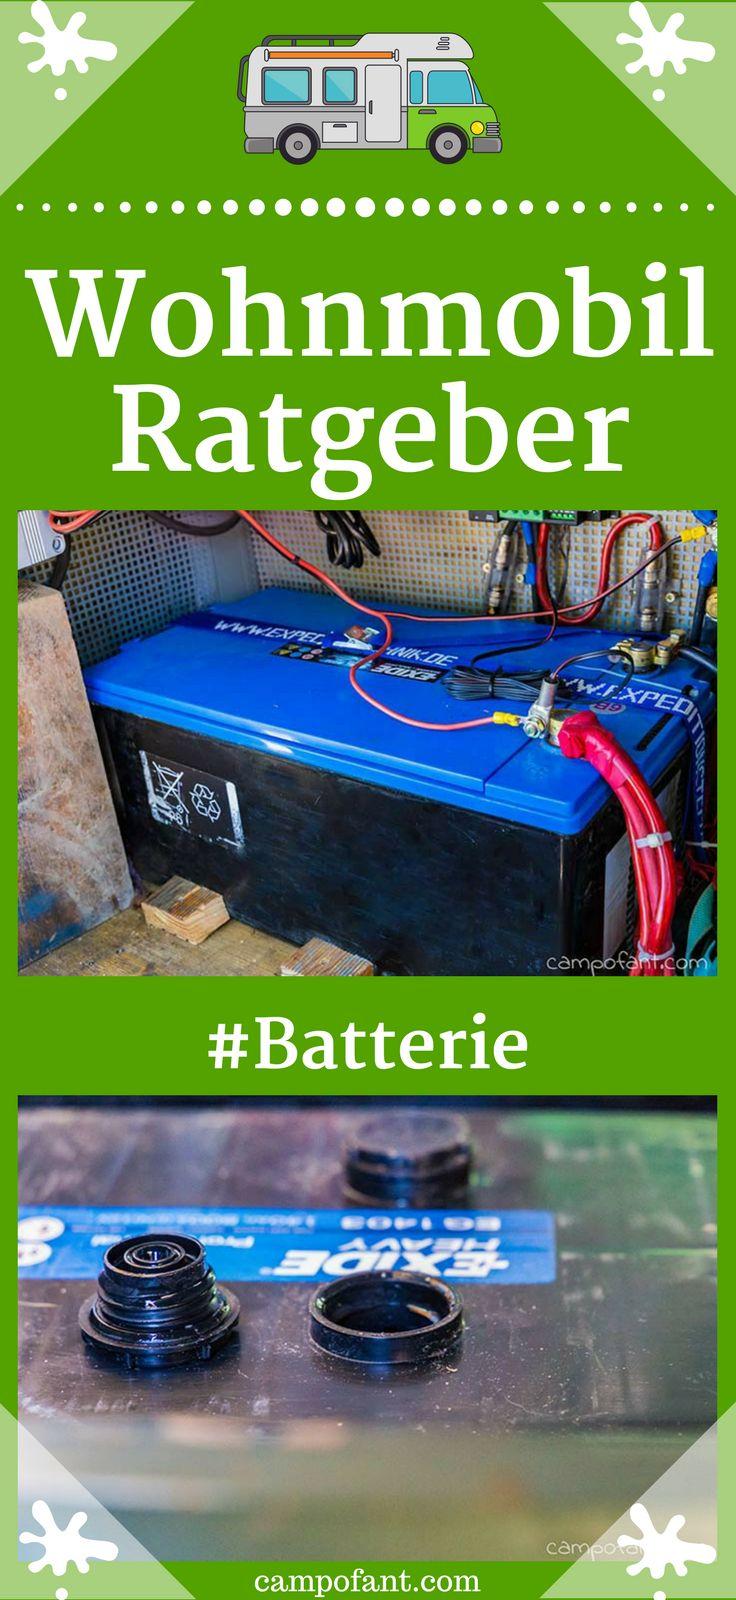 Mejores 75 imágenes de Wohnmobil Ratgeber en Pinterest | Campistas ...